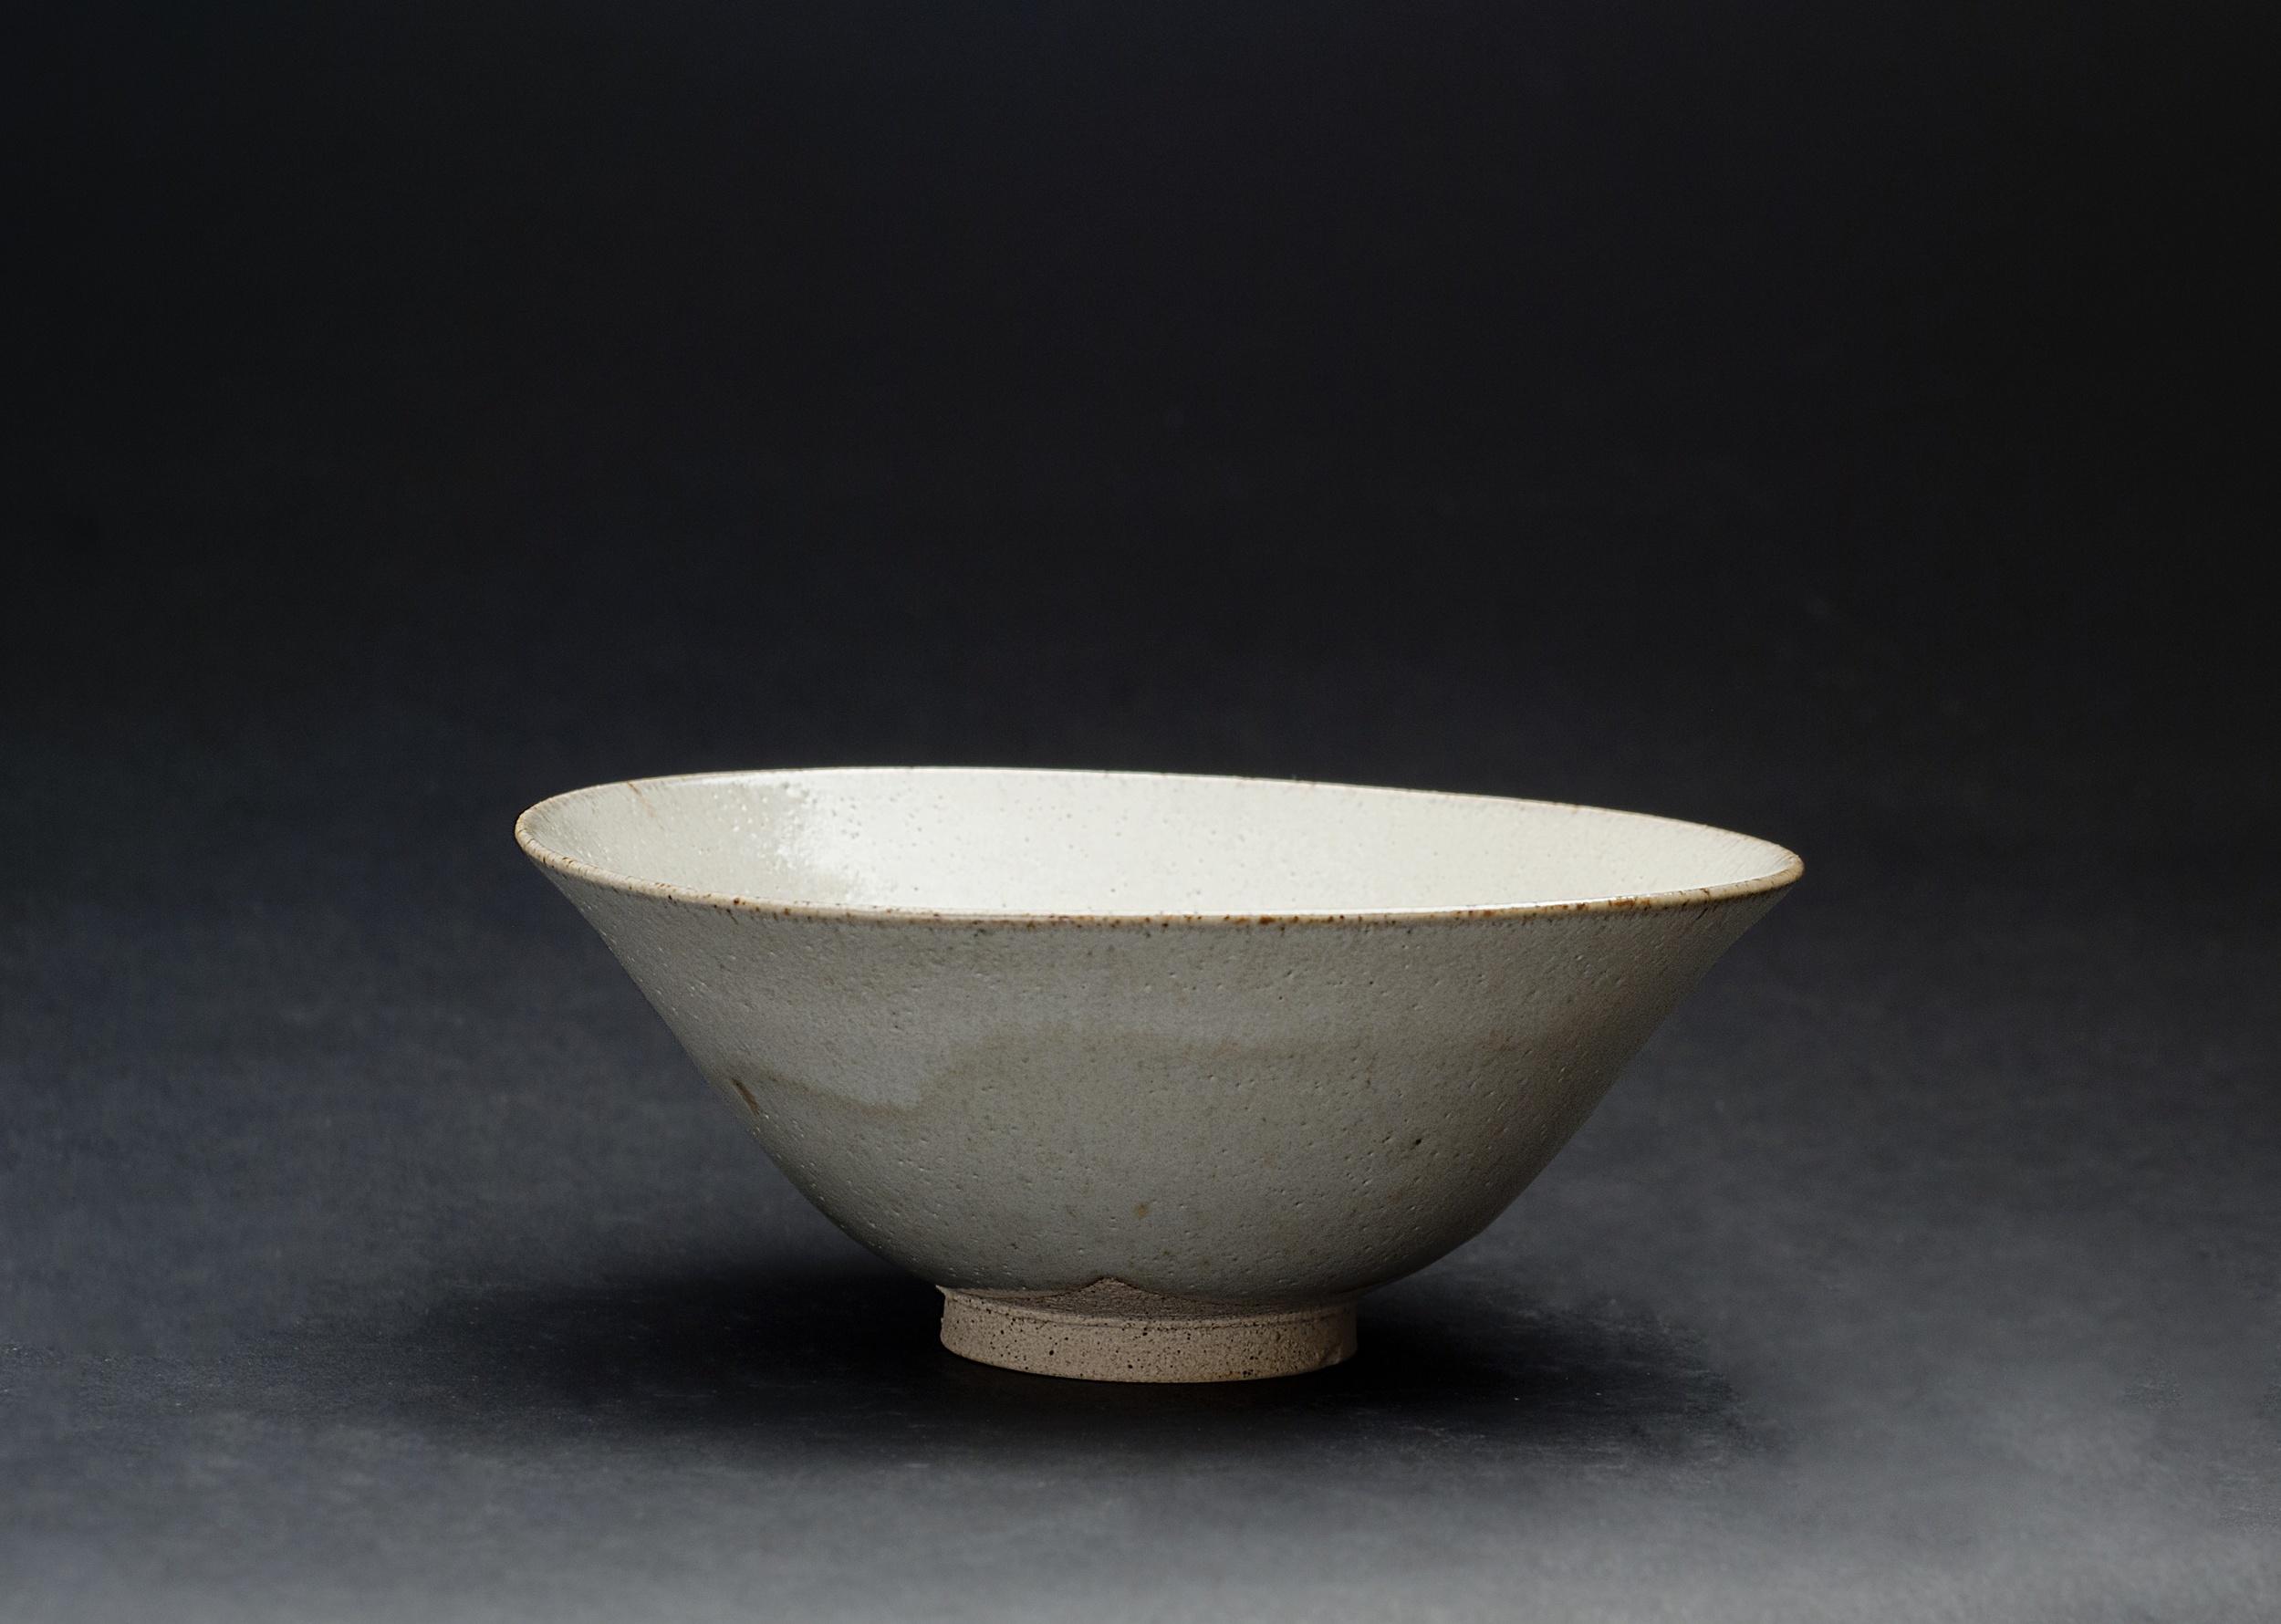 Gyozo Furuse    Summer Tea bowl   Akahada ware, fired ceramic 6 x 6 x 2.25 inches 15.2 x 15.2 x 5.7 cm GFu 1